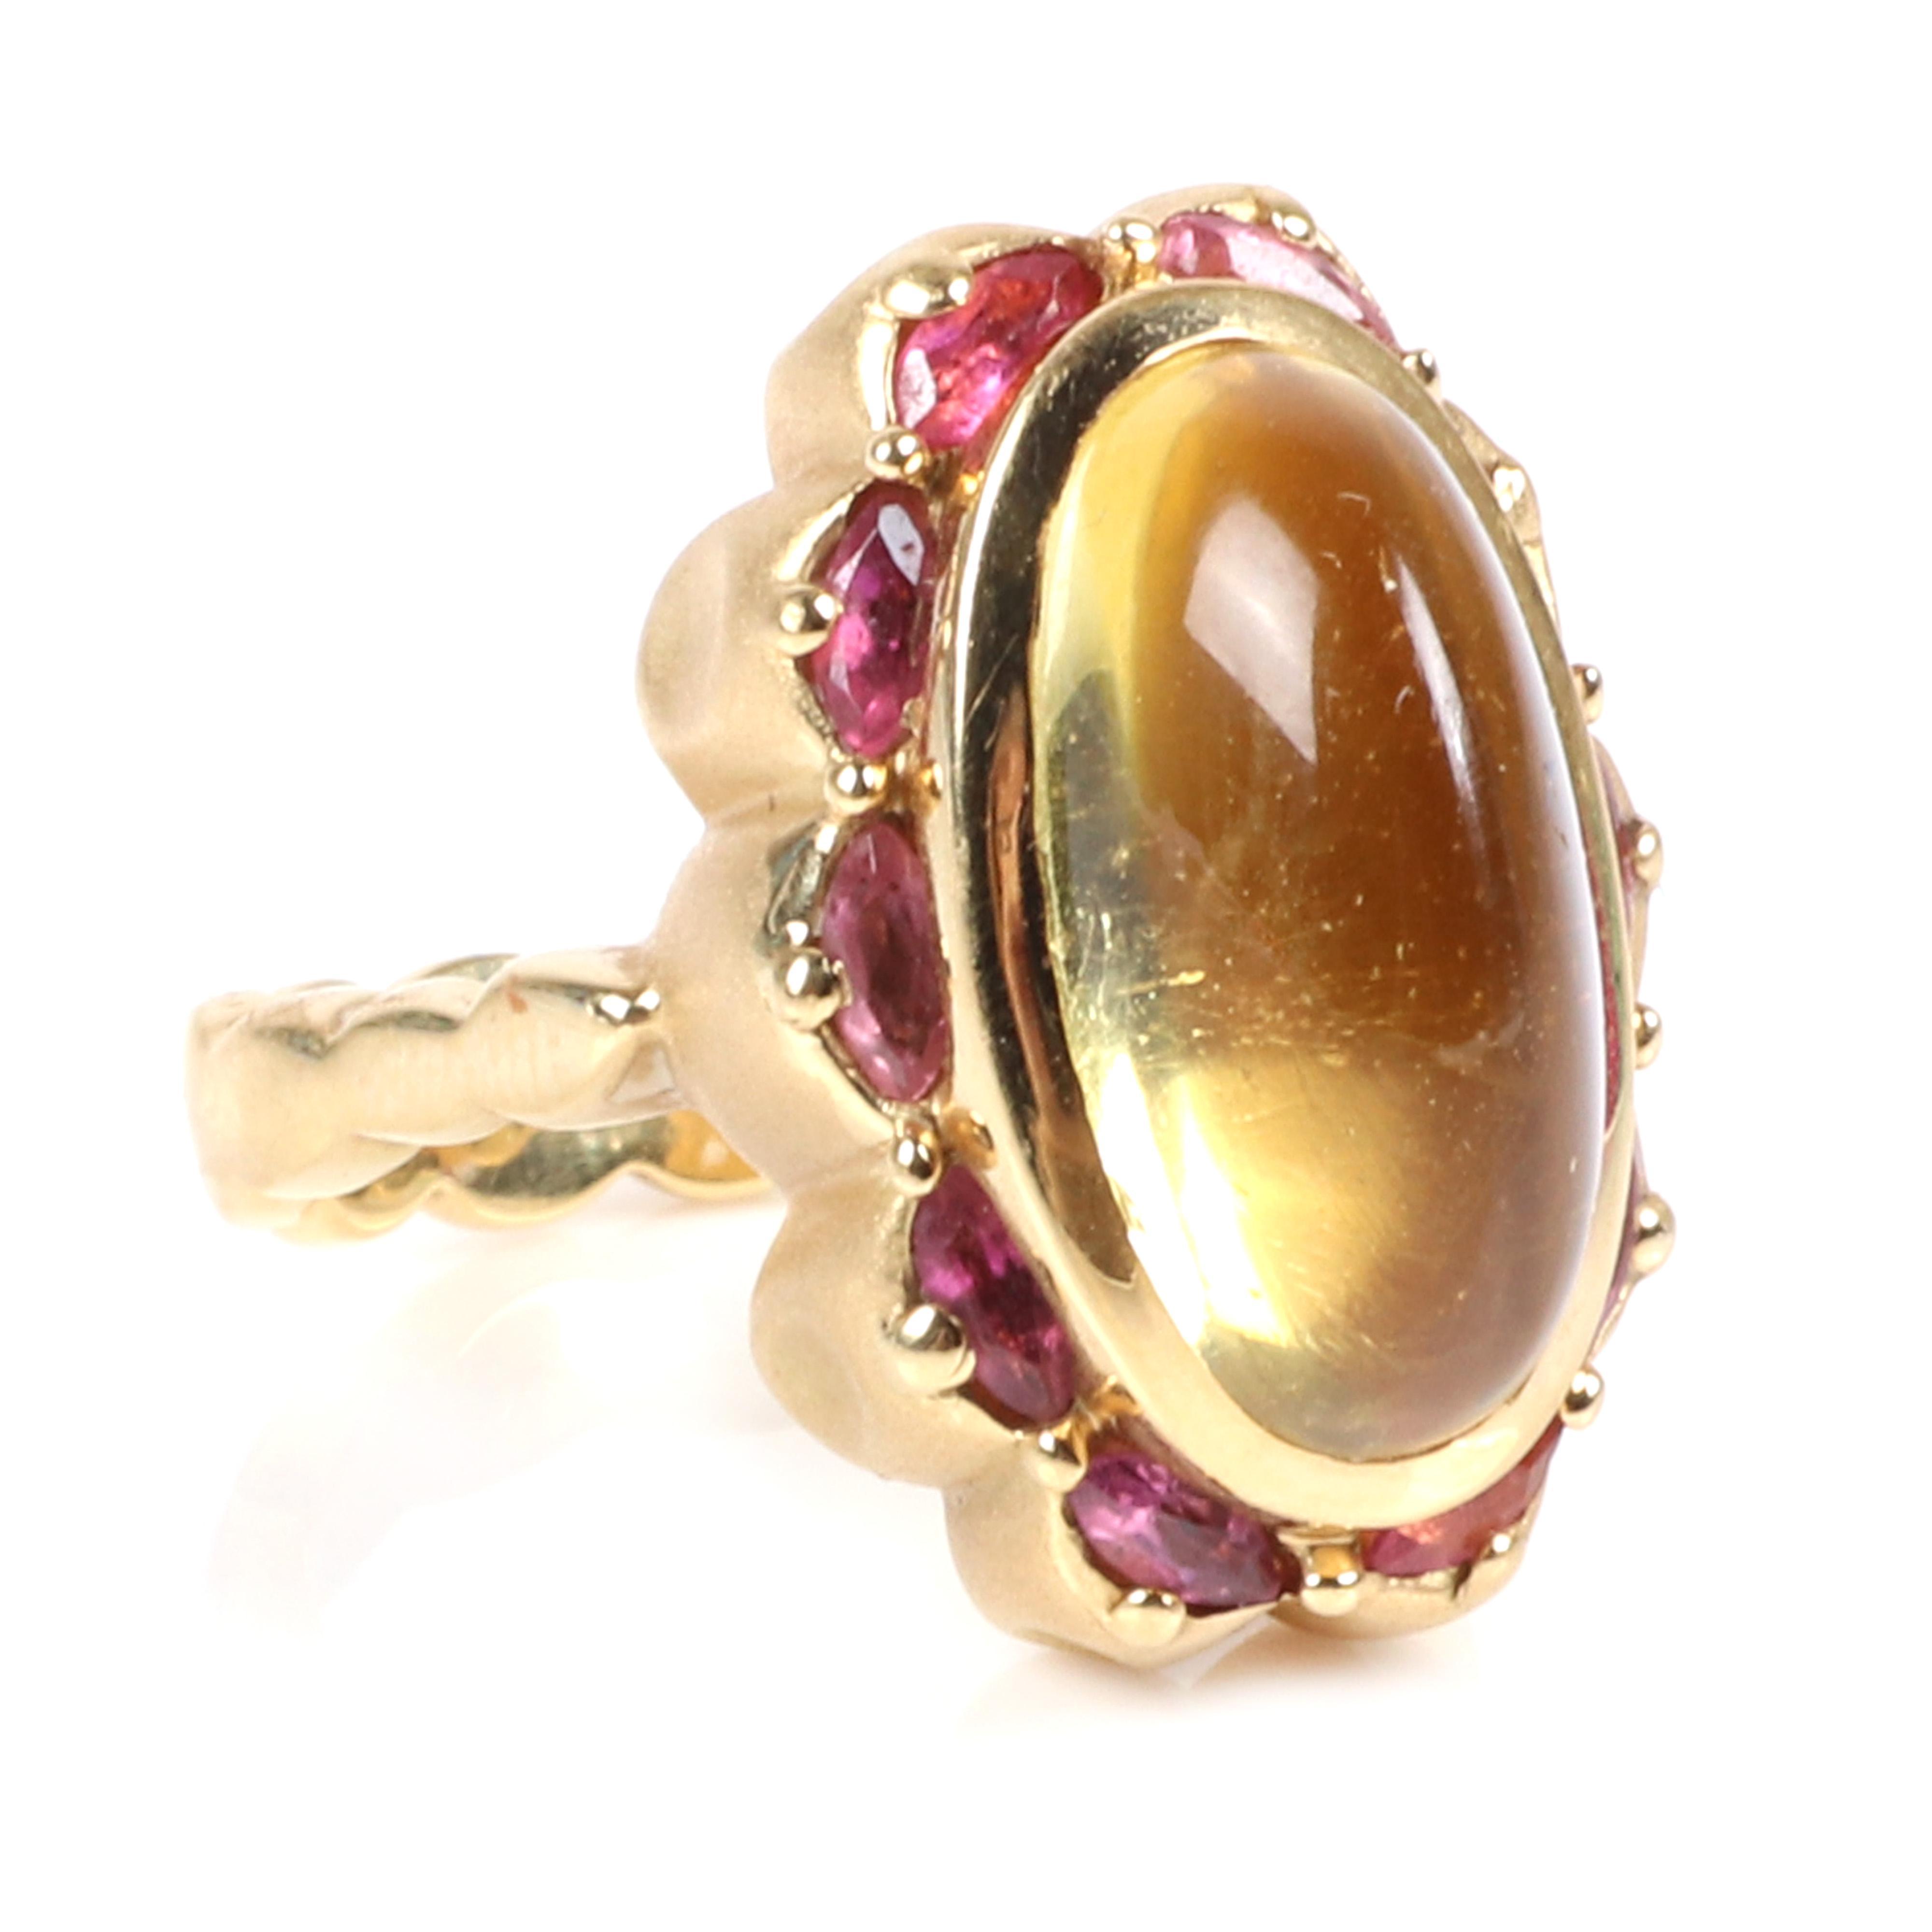 Stamped 18K gold custom designer modern ring with lemon quartz oval cabochon and garnets, 15.07 dwt. Ring Size 6 1/2